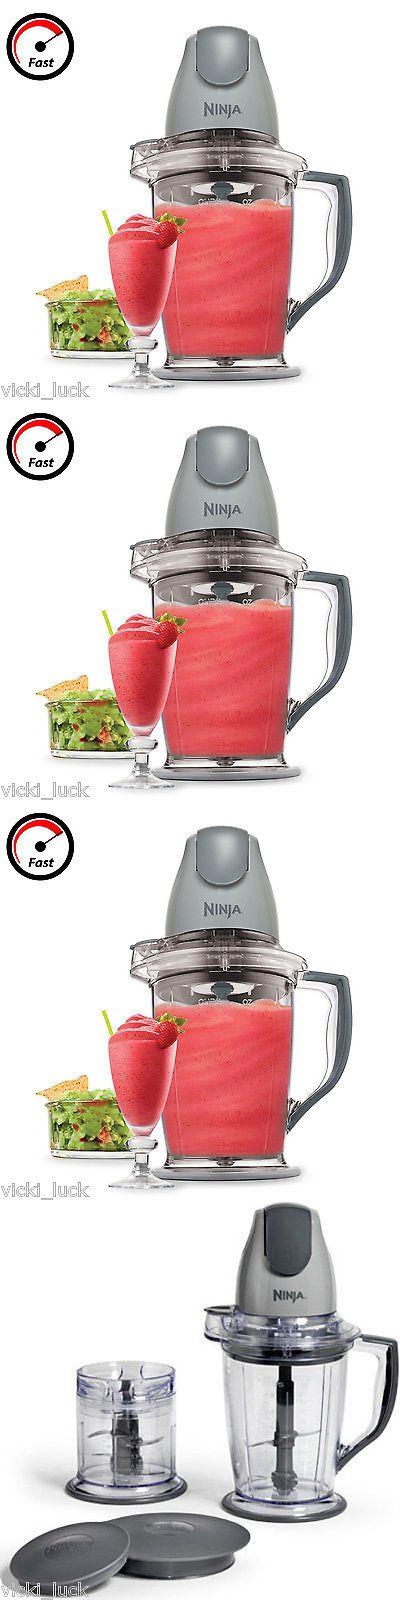 Ninja Master Prep 5C Food Processor